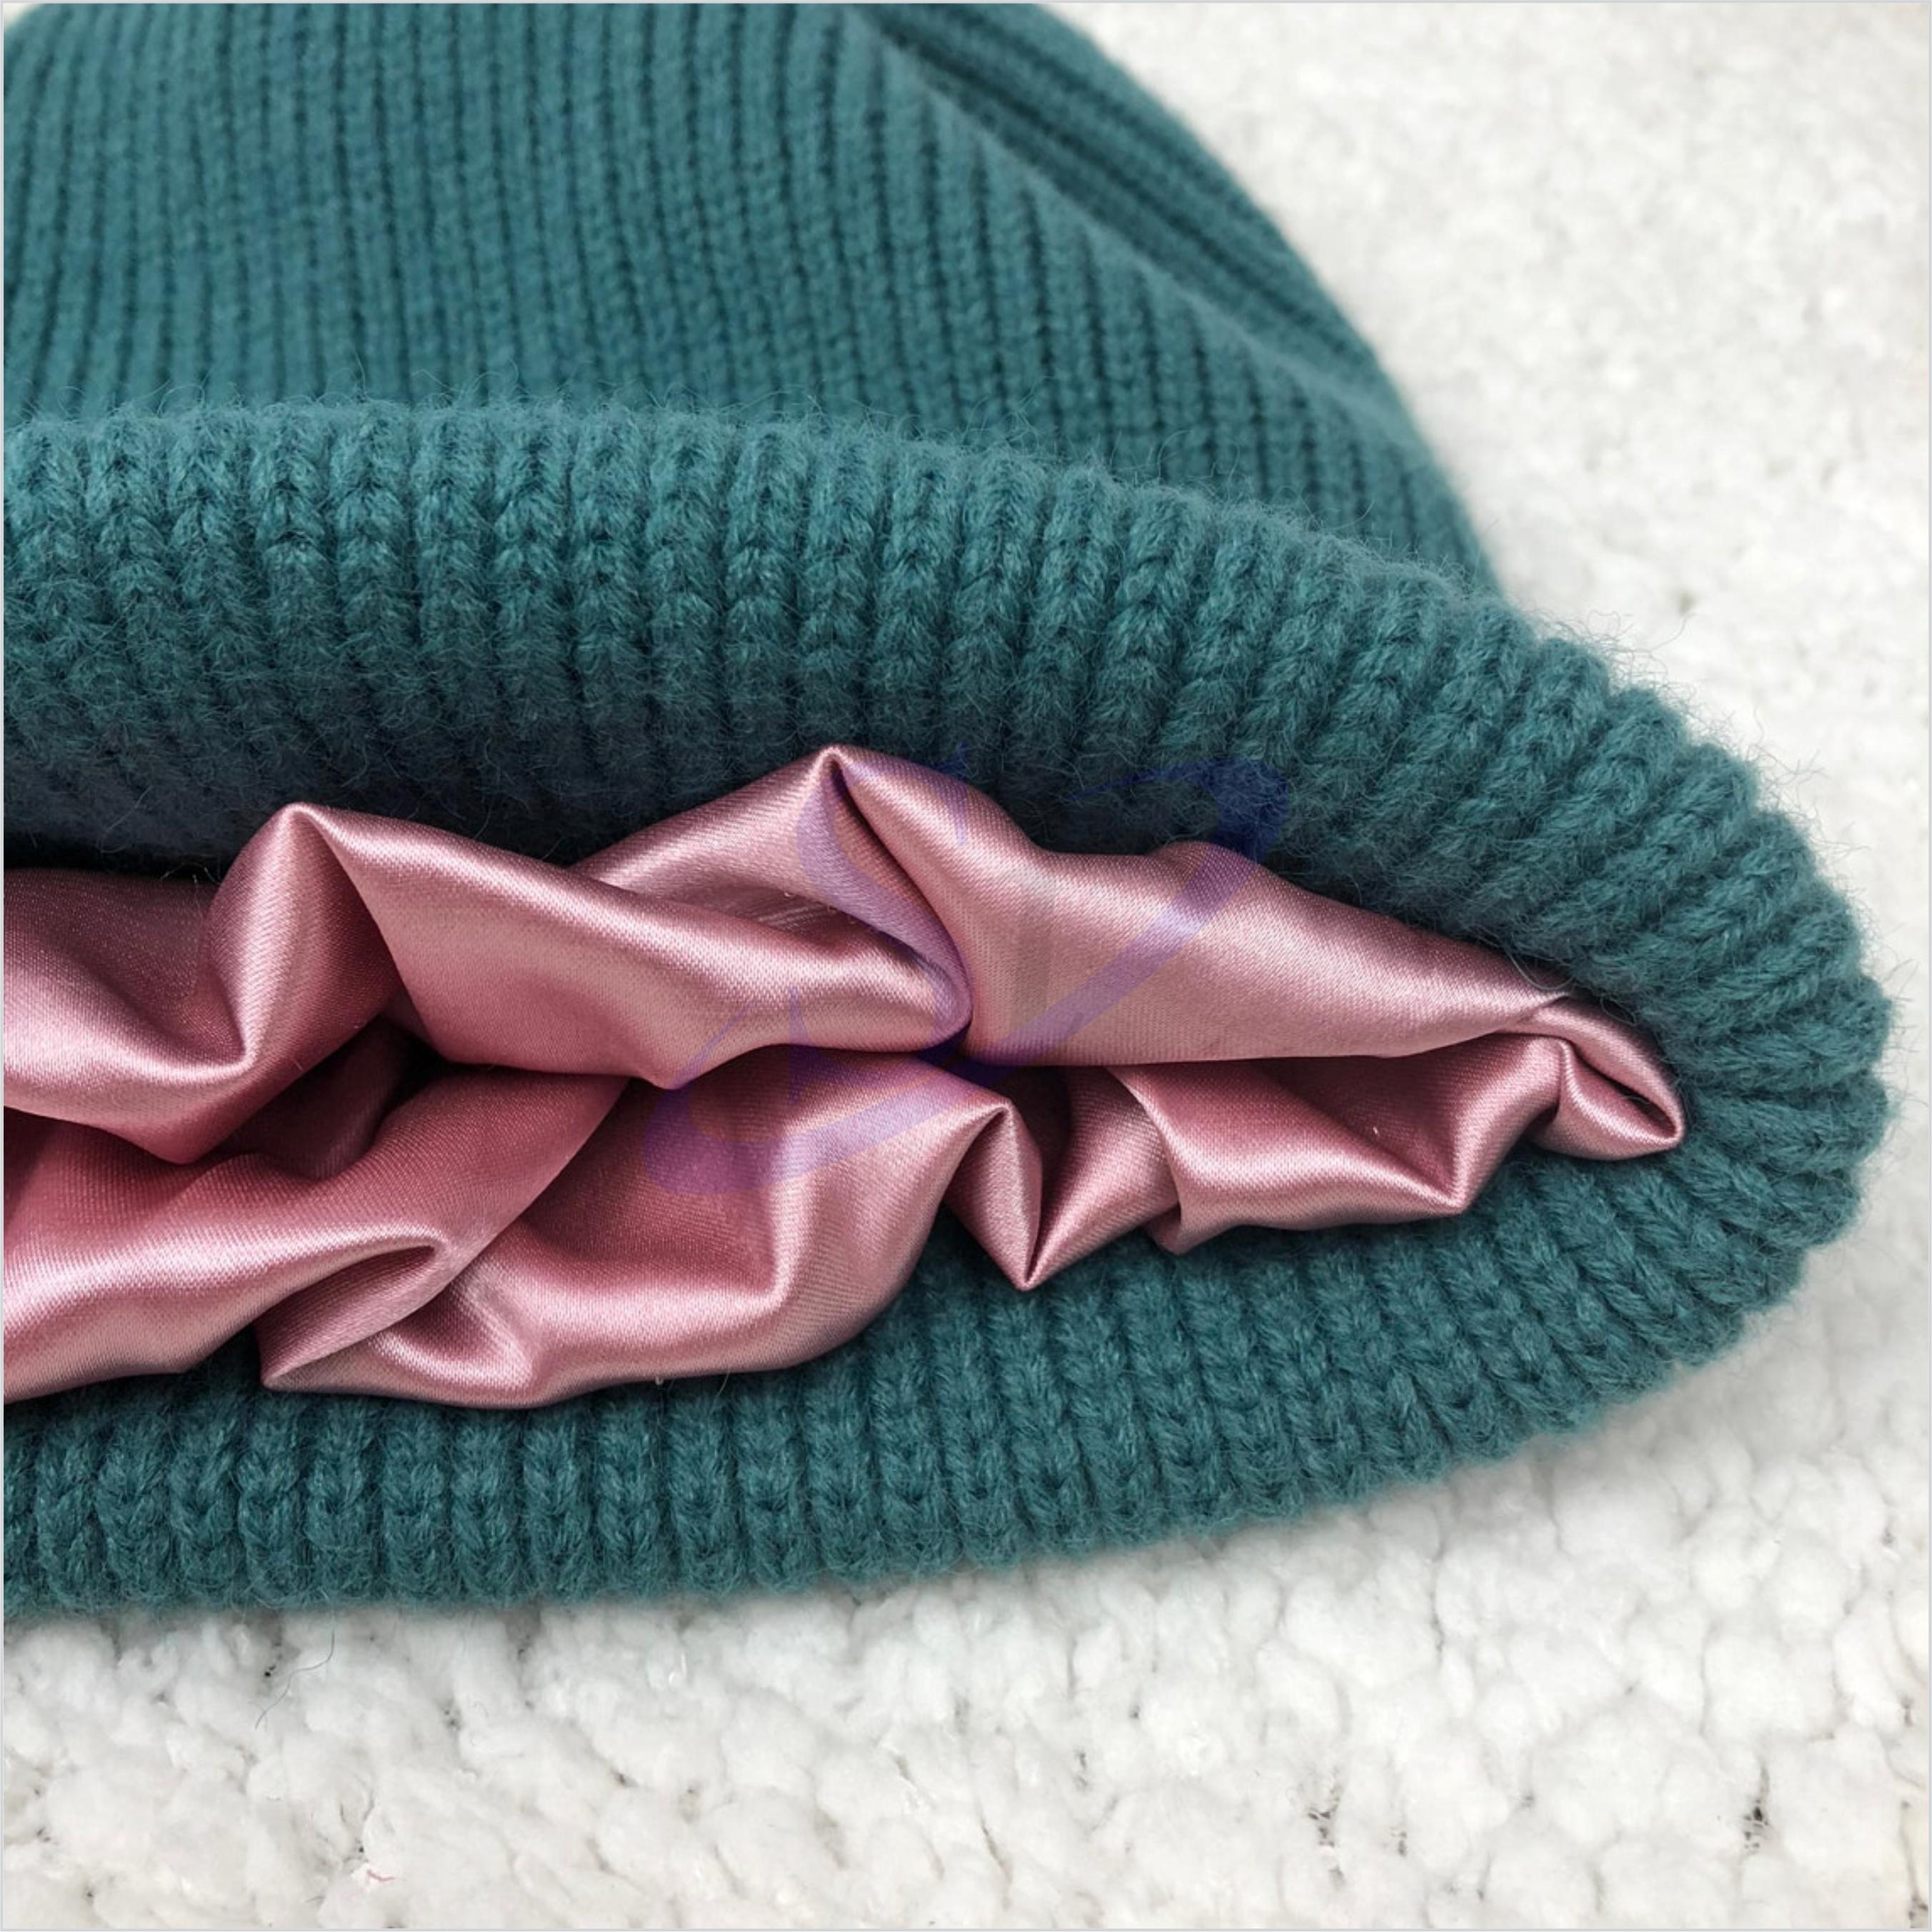 wholesale beanie hats unisex custom logo beanie hats for winter